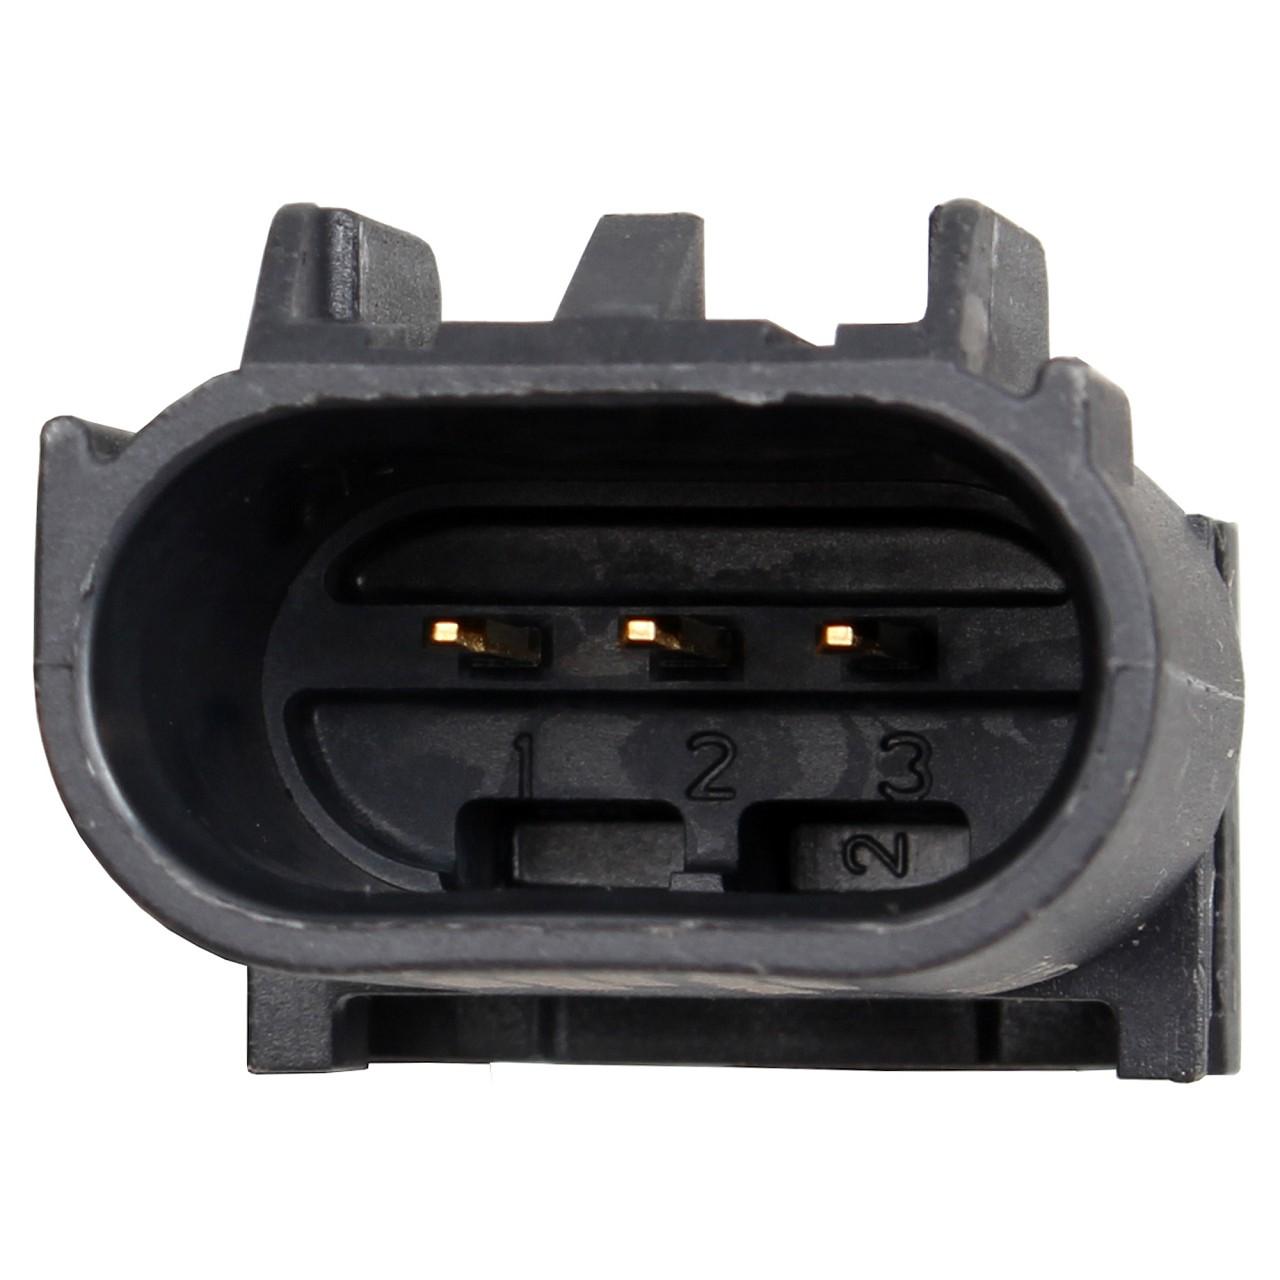 ORIGINAL Ford Abgasdrucksensoren Drucksensor TRANSIT 2.2TDCi ab 01.2014 2188981